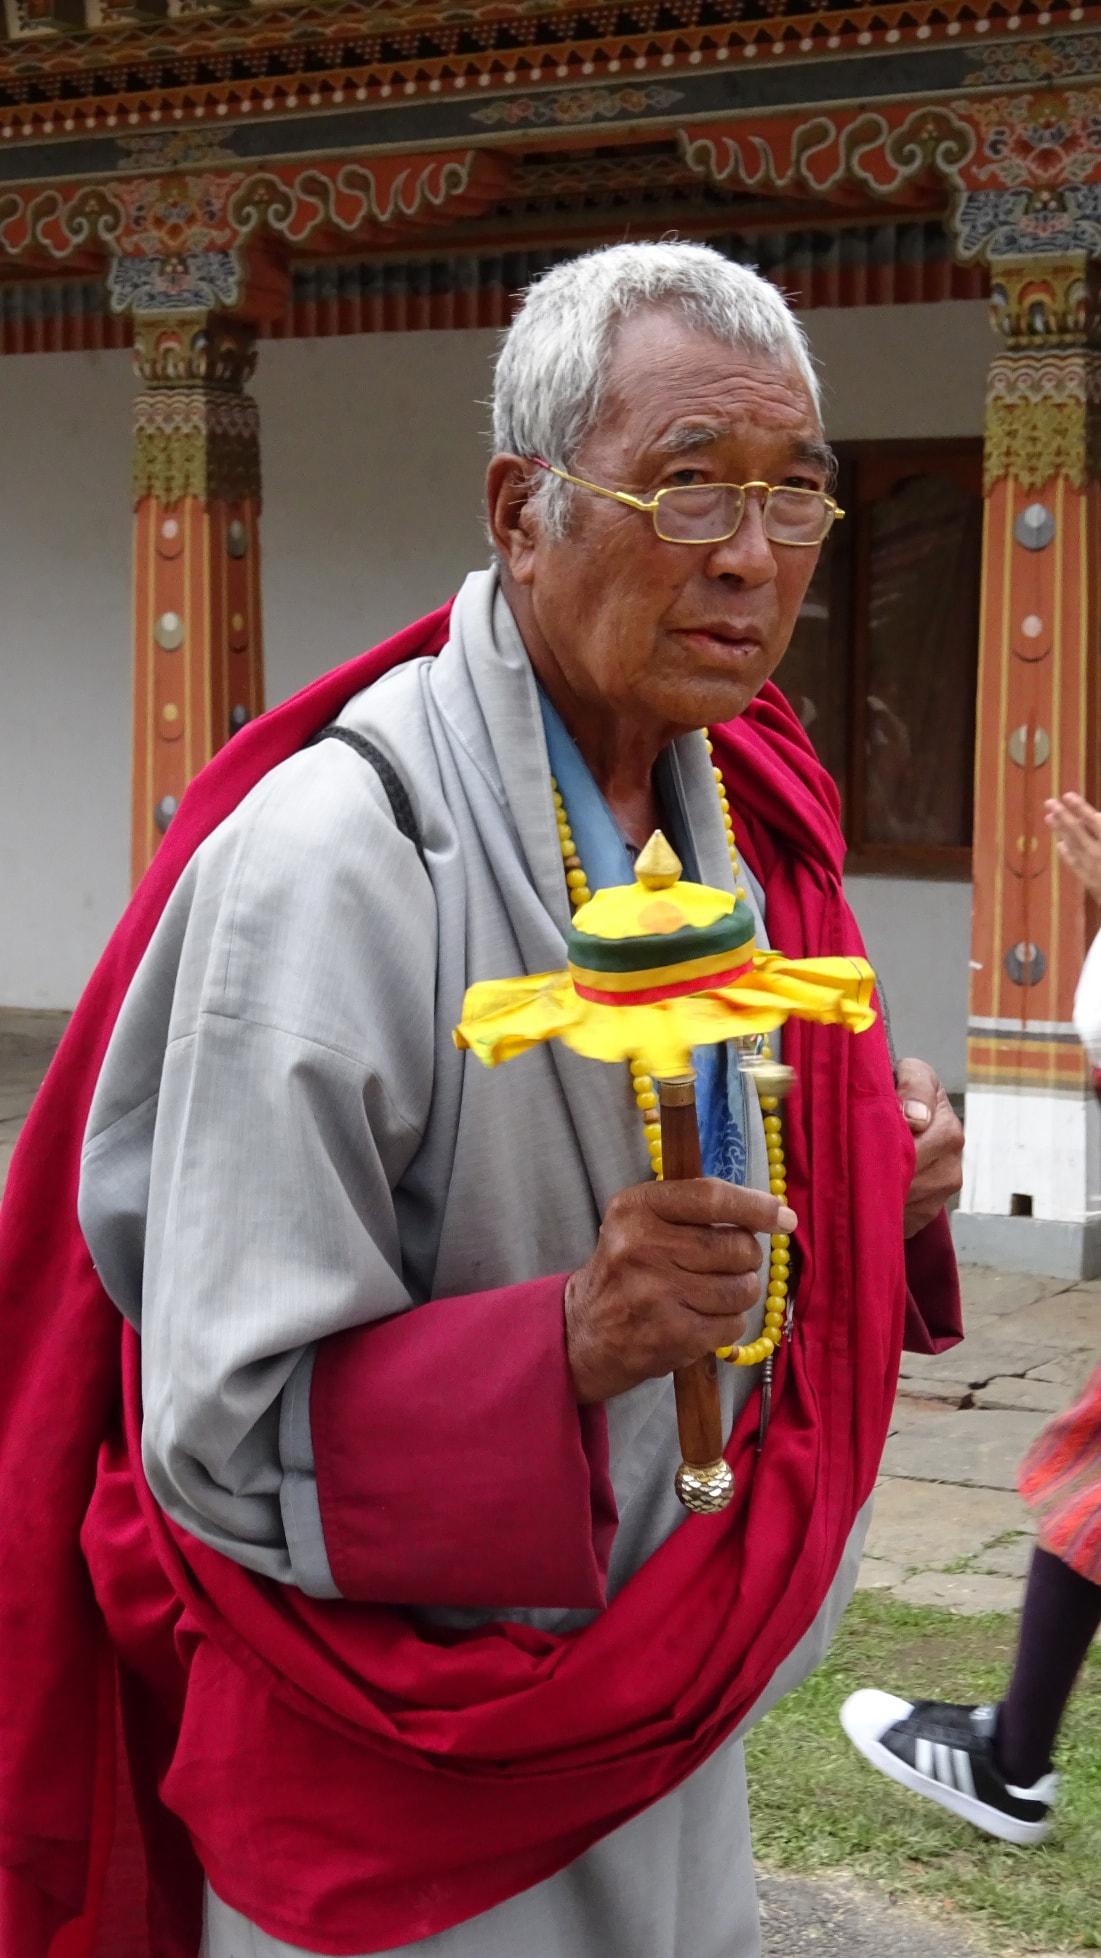 Monk at Tshechu festival copy-min